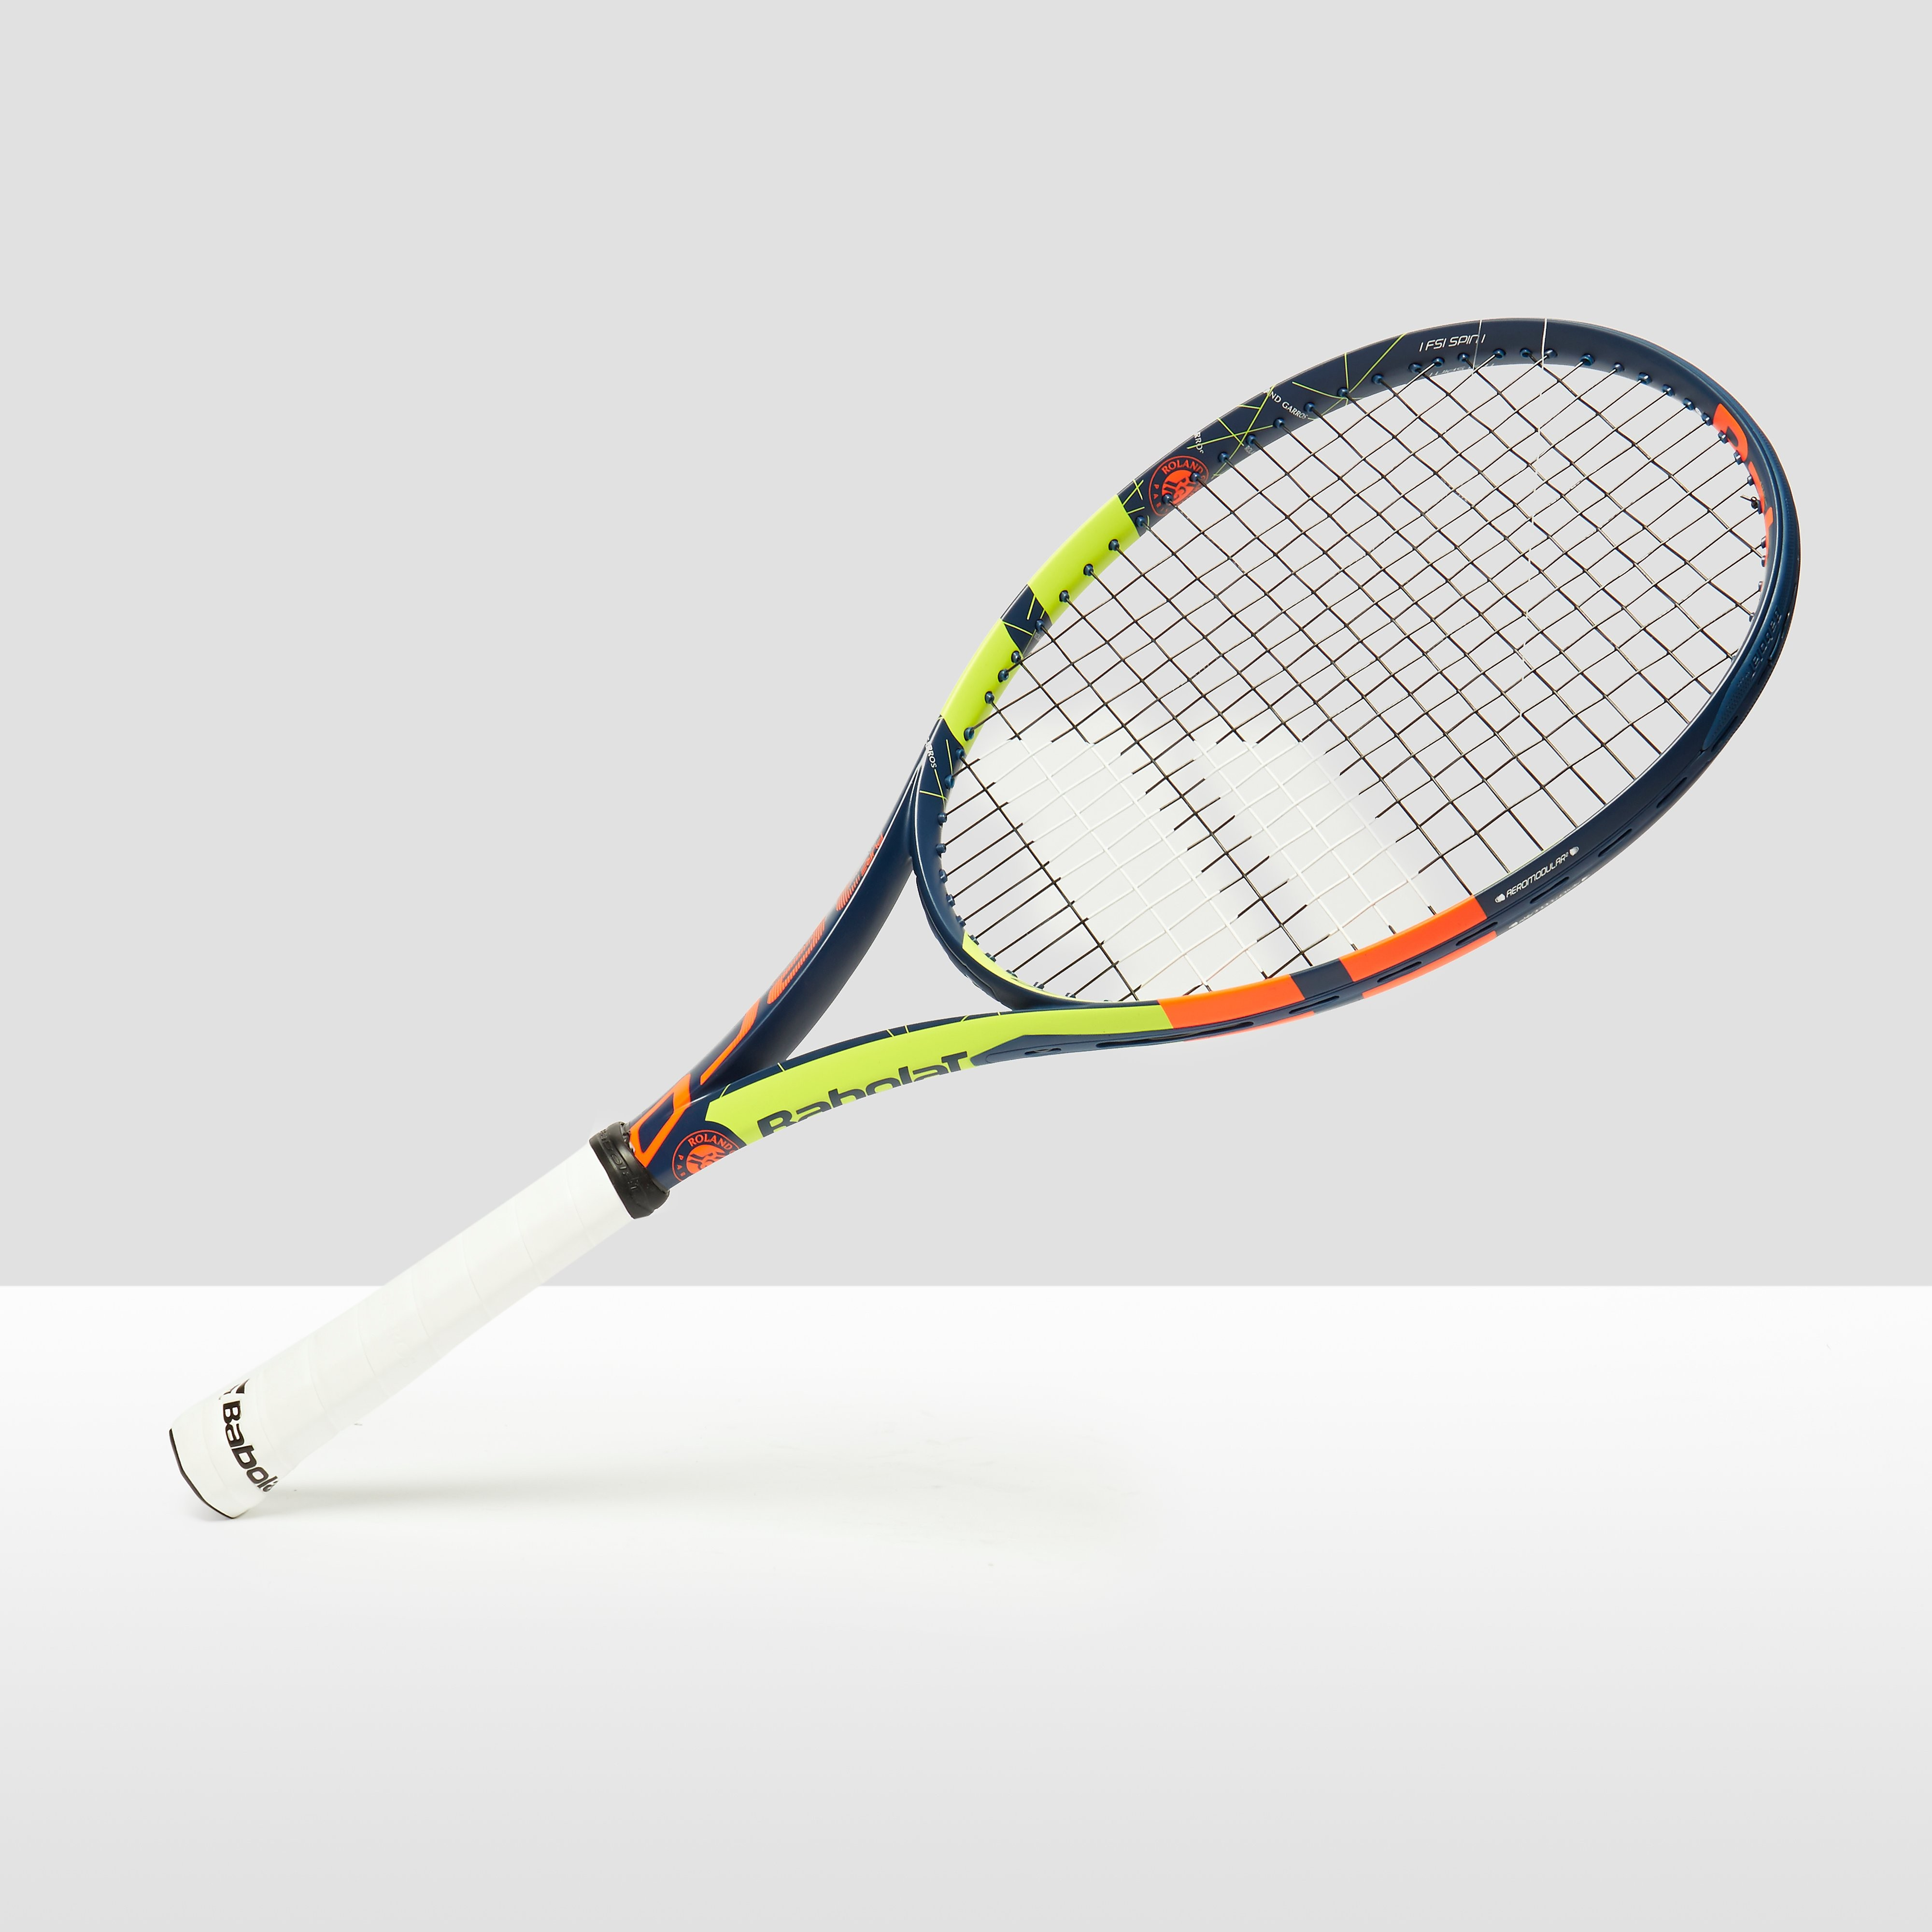 Babolat Pure Aero French Open Roland Garros Tennis Racket